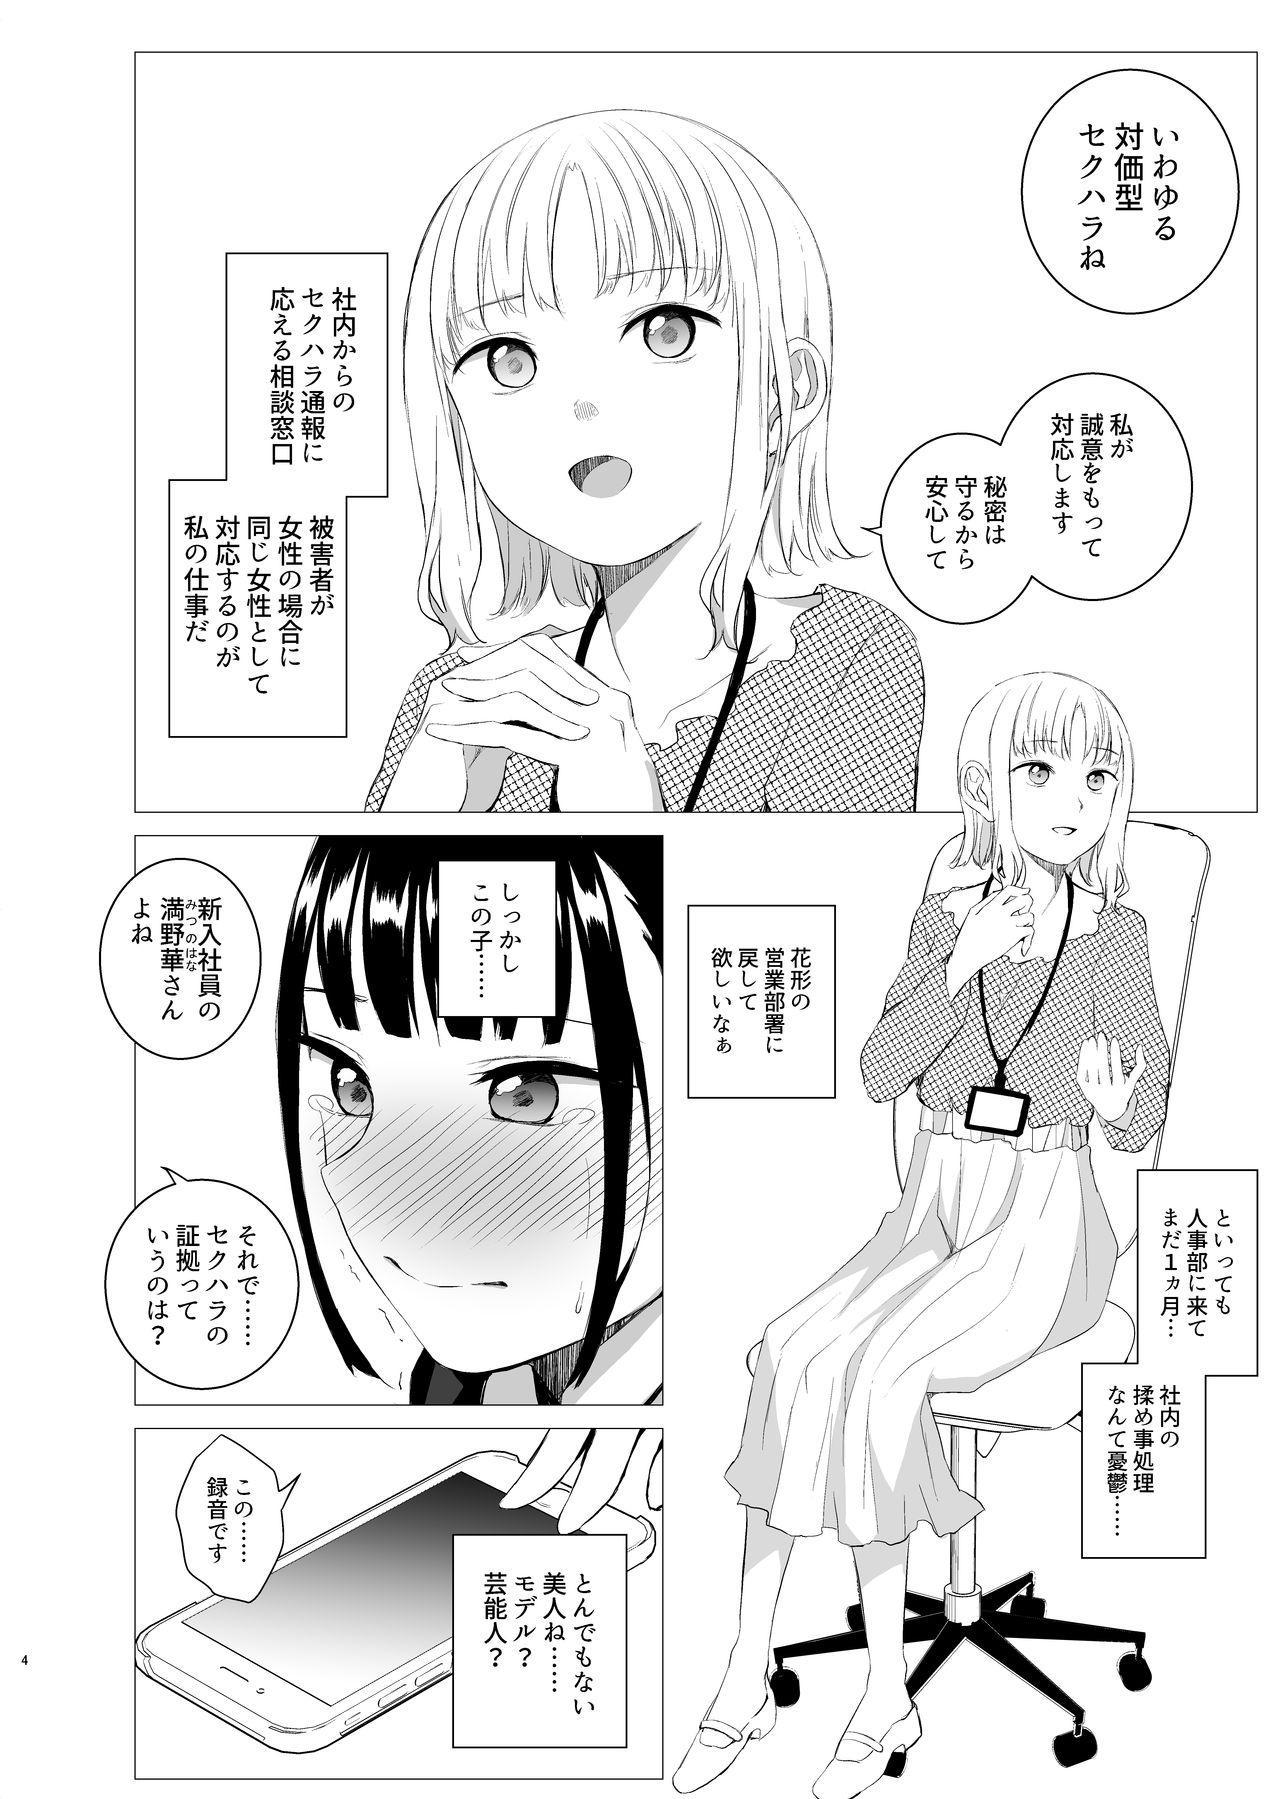 Hanayomi no Makurakotoba 2